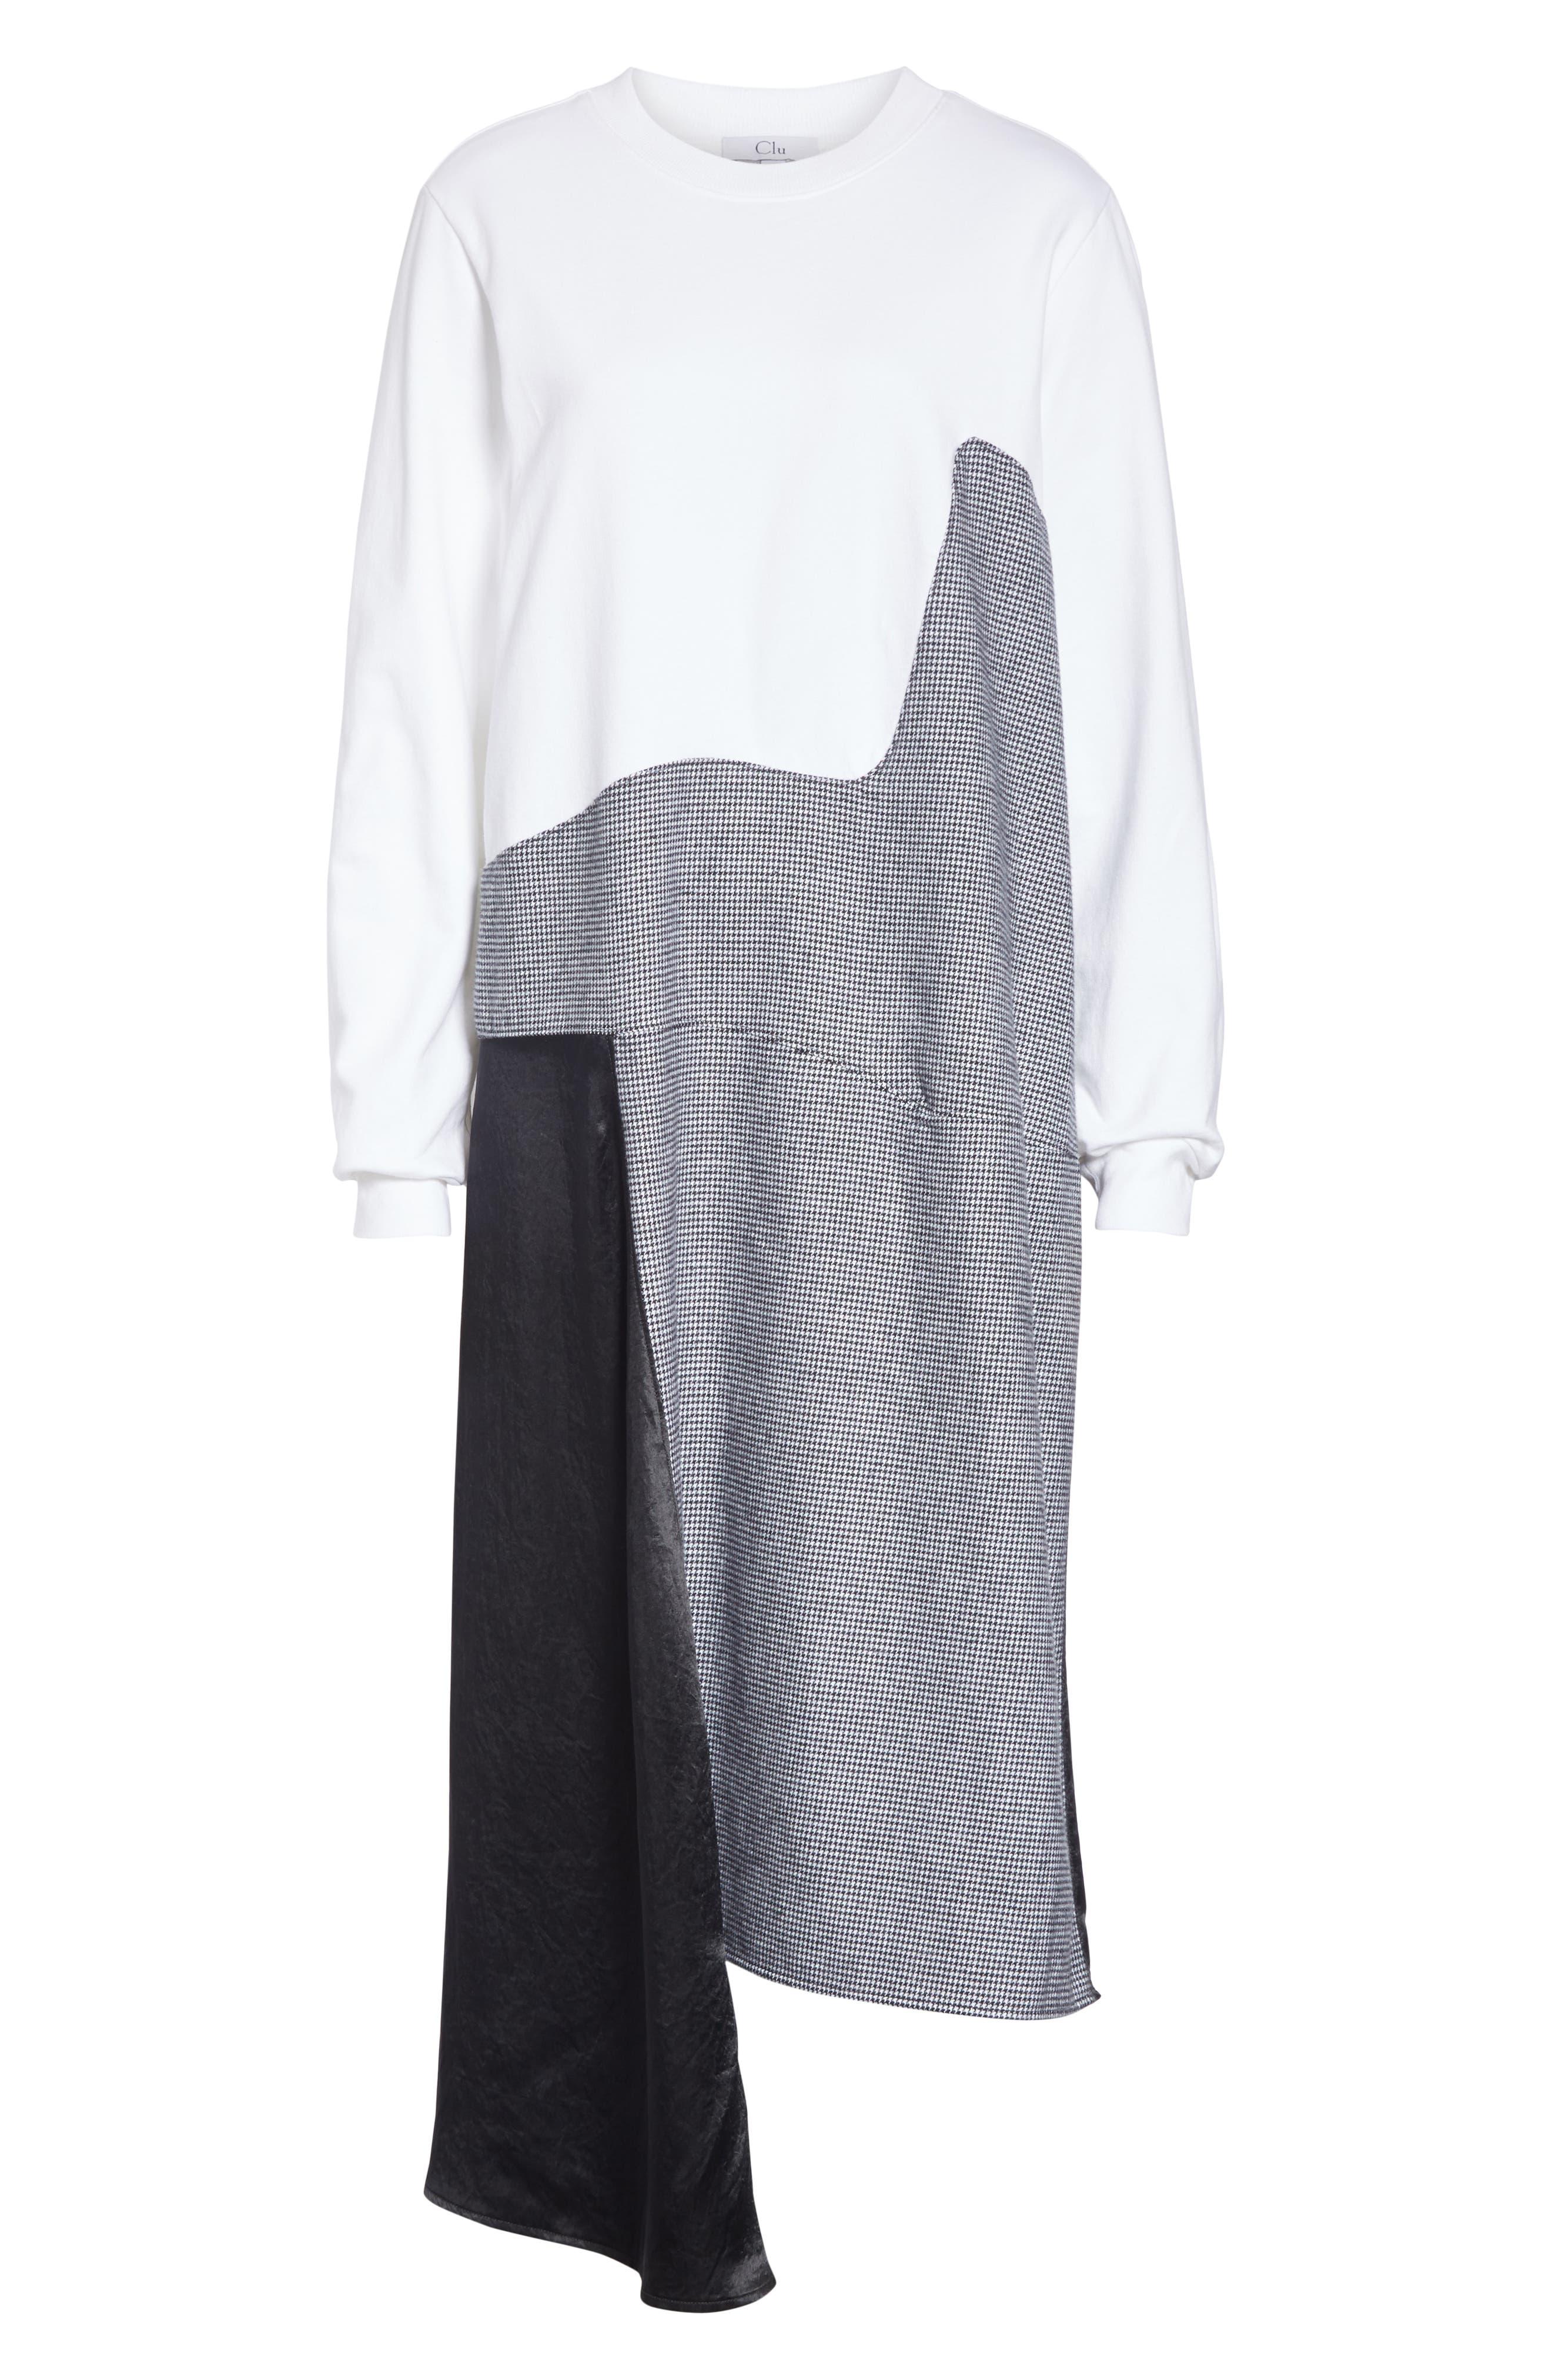 Colorblock Asymmetric Dress,                             Alternate thumbnail 7, color,                             WHITE/ BLACK